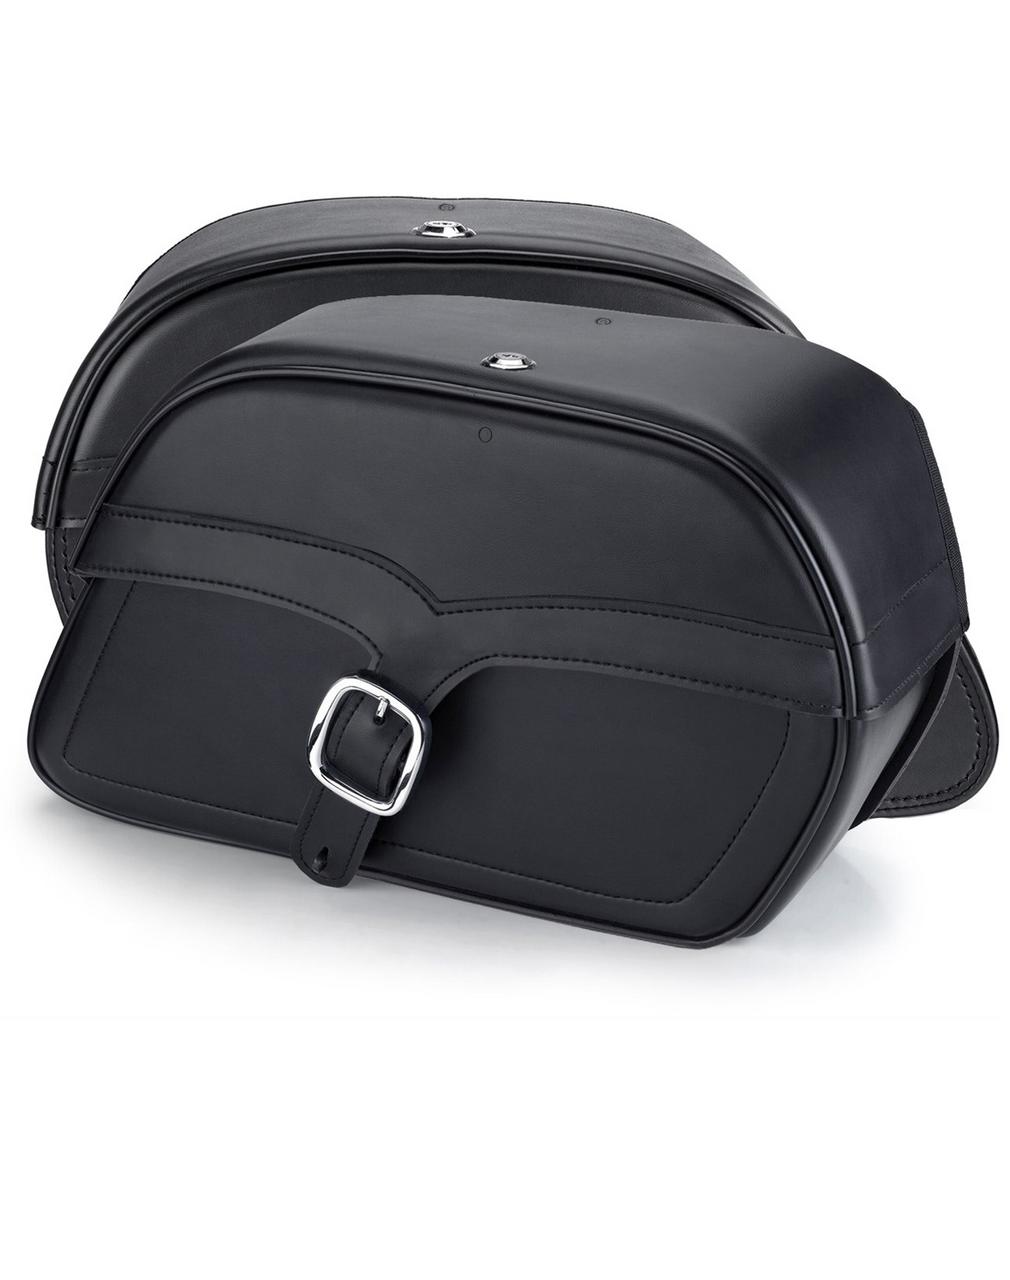 Honda VTX 1800 R Charger Single Strap Medium Motorcycle Saddlebags Both Bags View